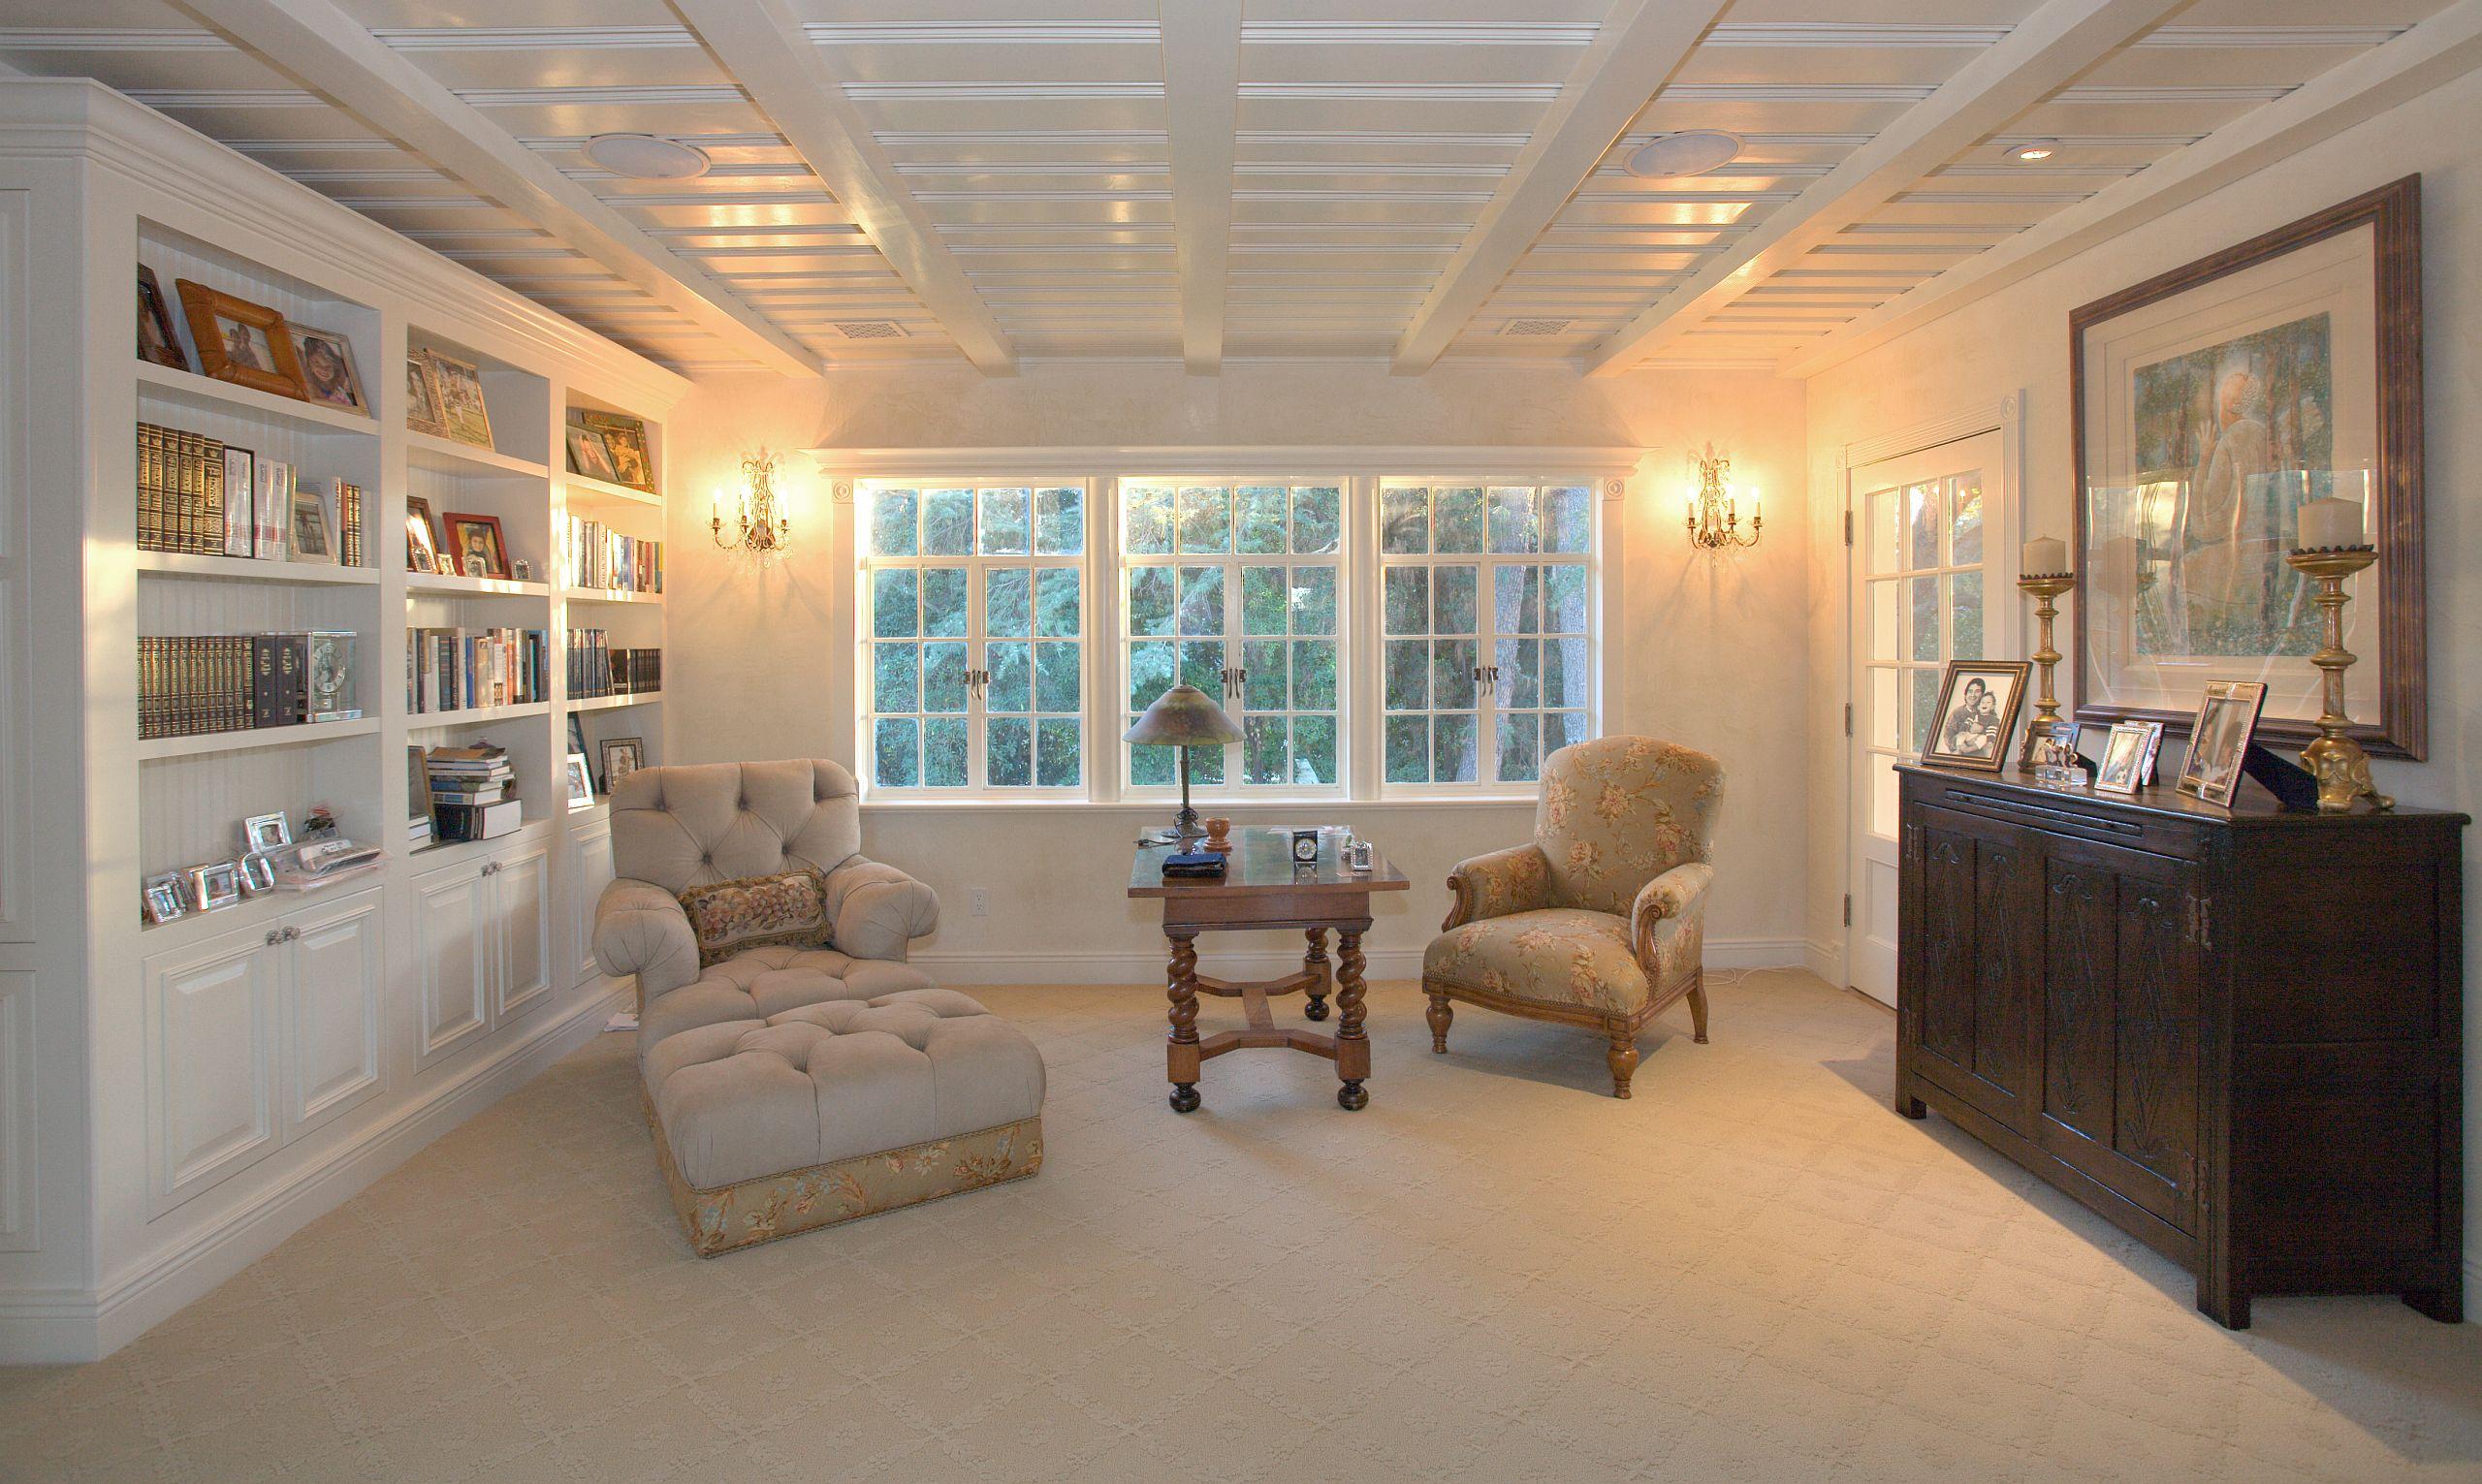 inhabit space inc renovates historic al jolson estate in los angeles. Black Bedroom Furniture Sets. Home Design Ideas